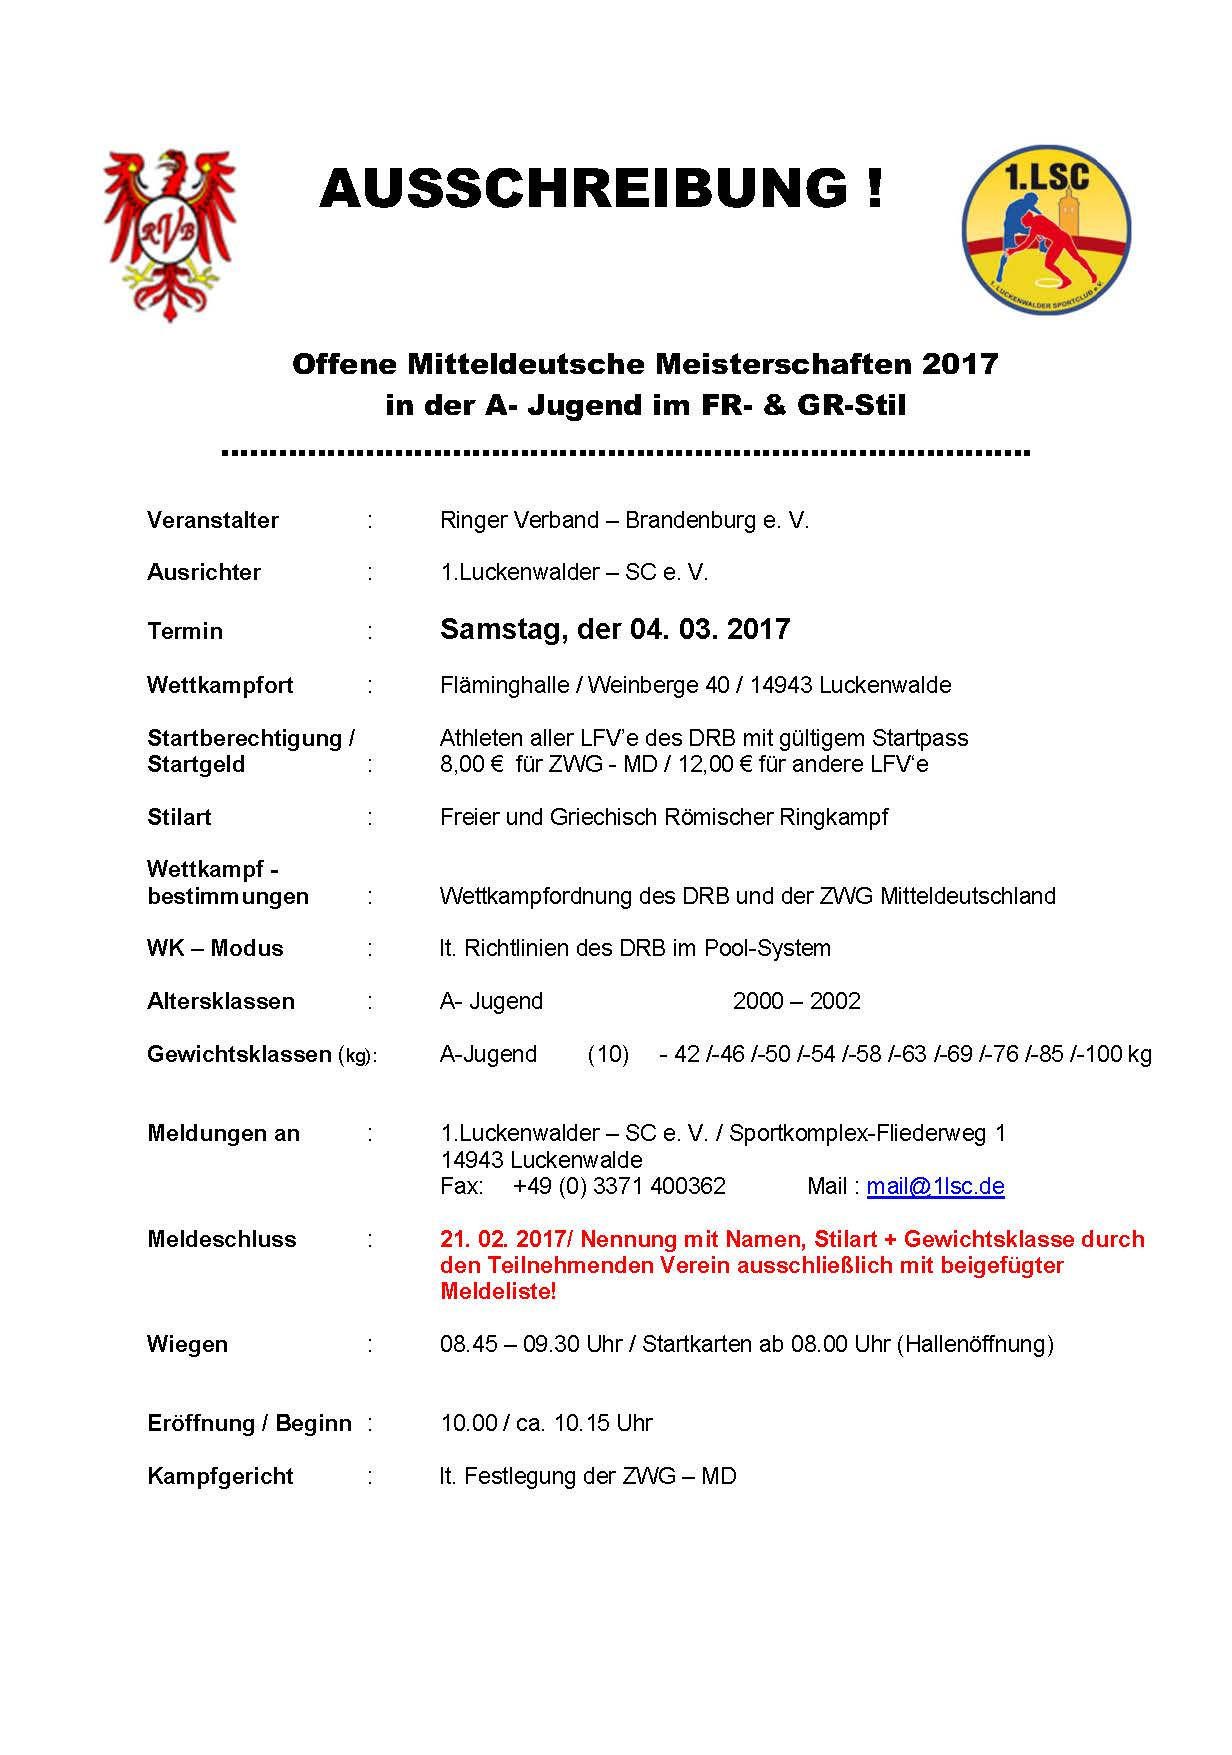 MDM A-Jugend FS/GR 2017